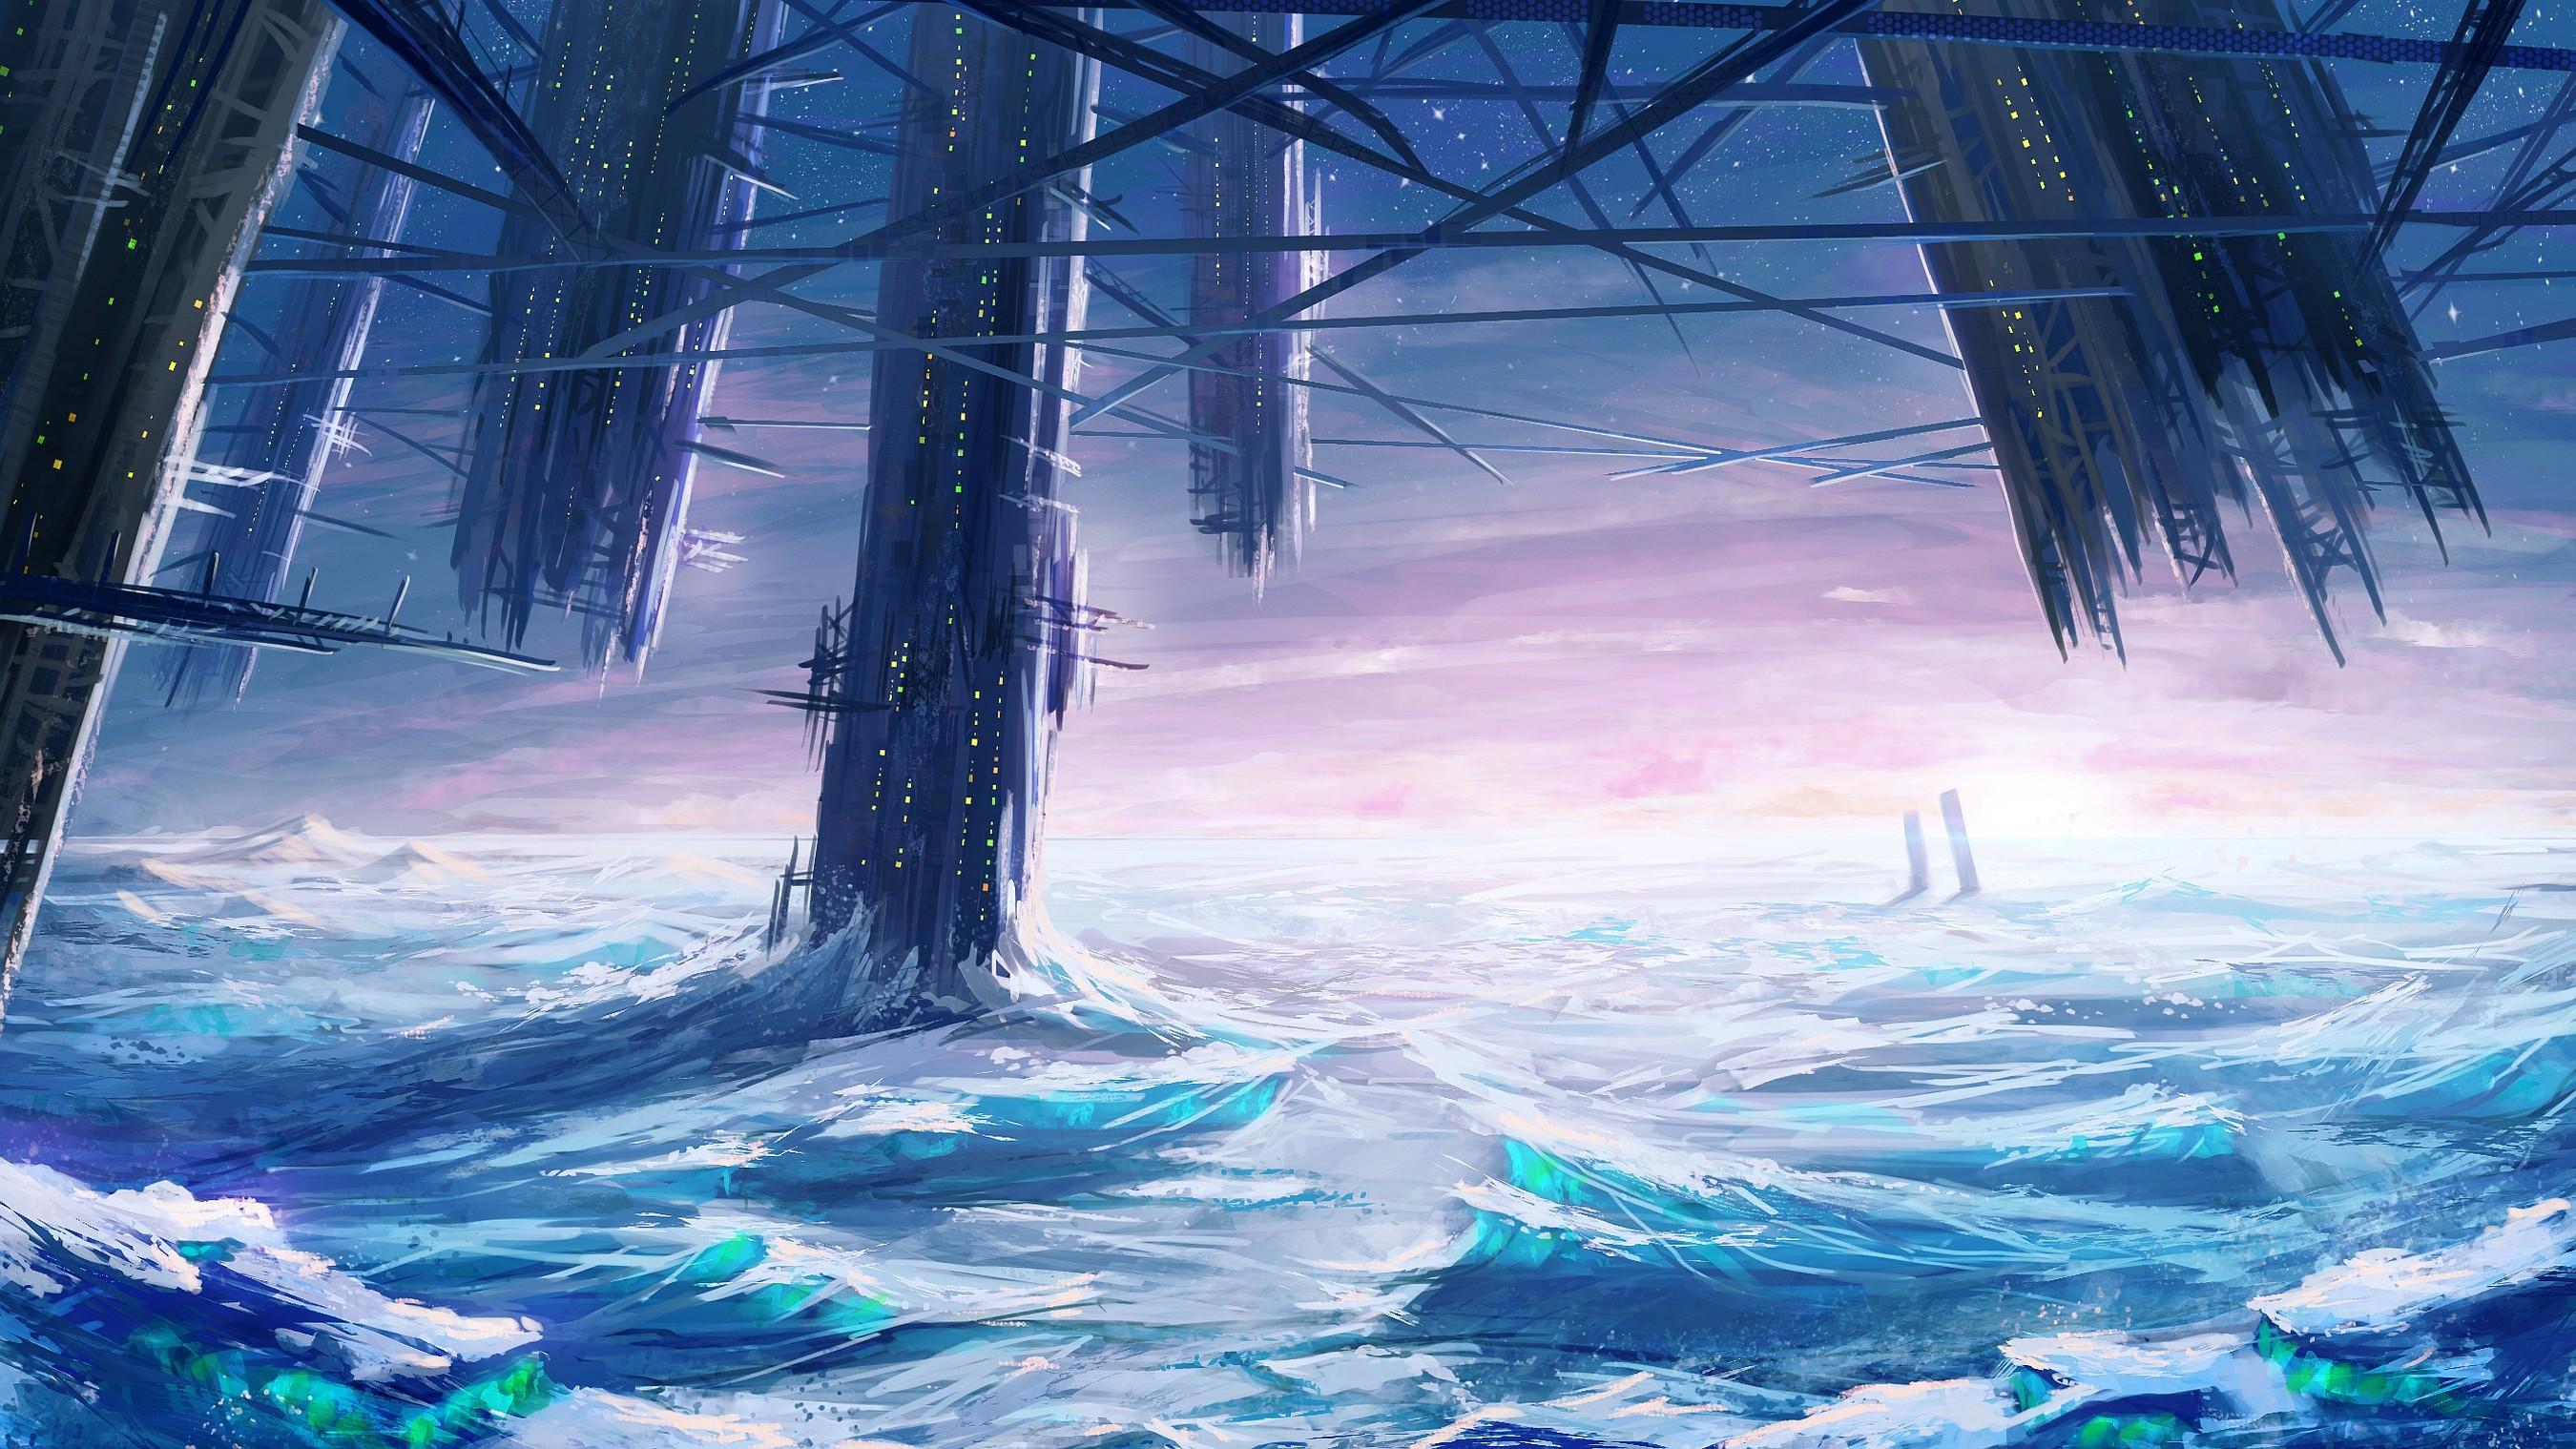 HD Wallpaper   Background ID:495942. Sci Fi Landscape